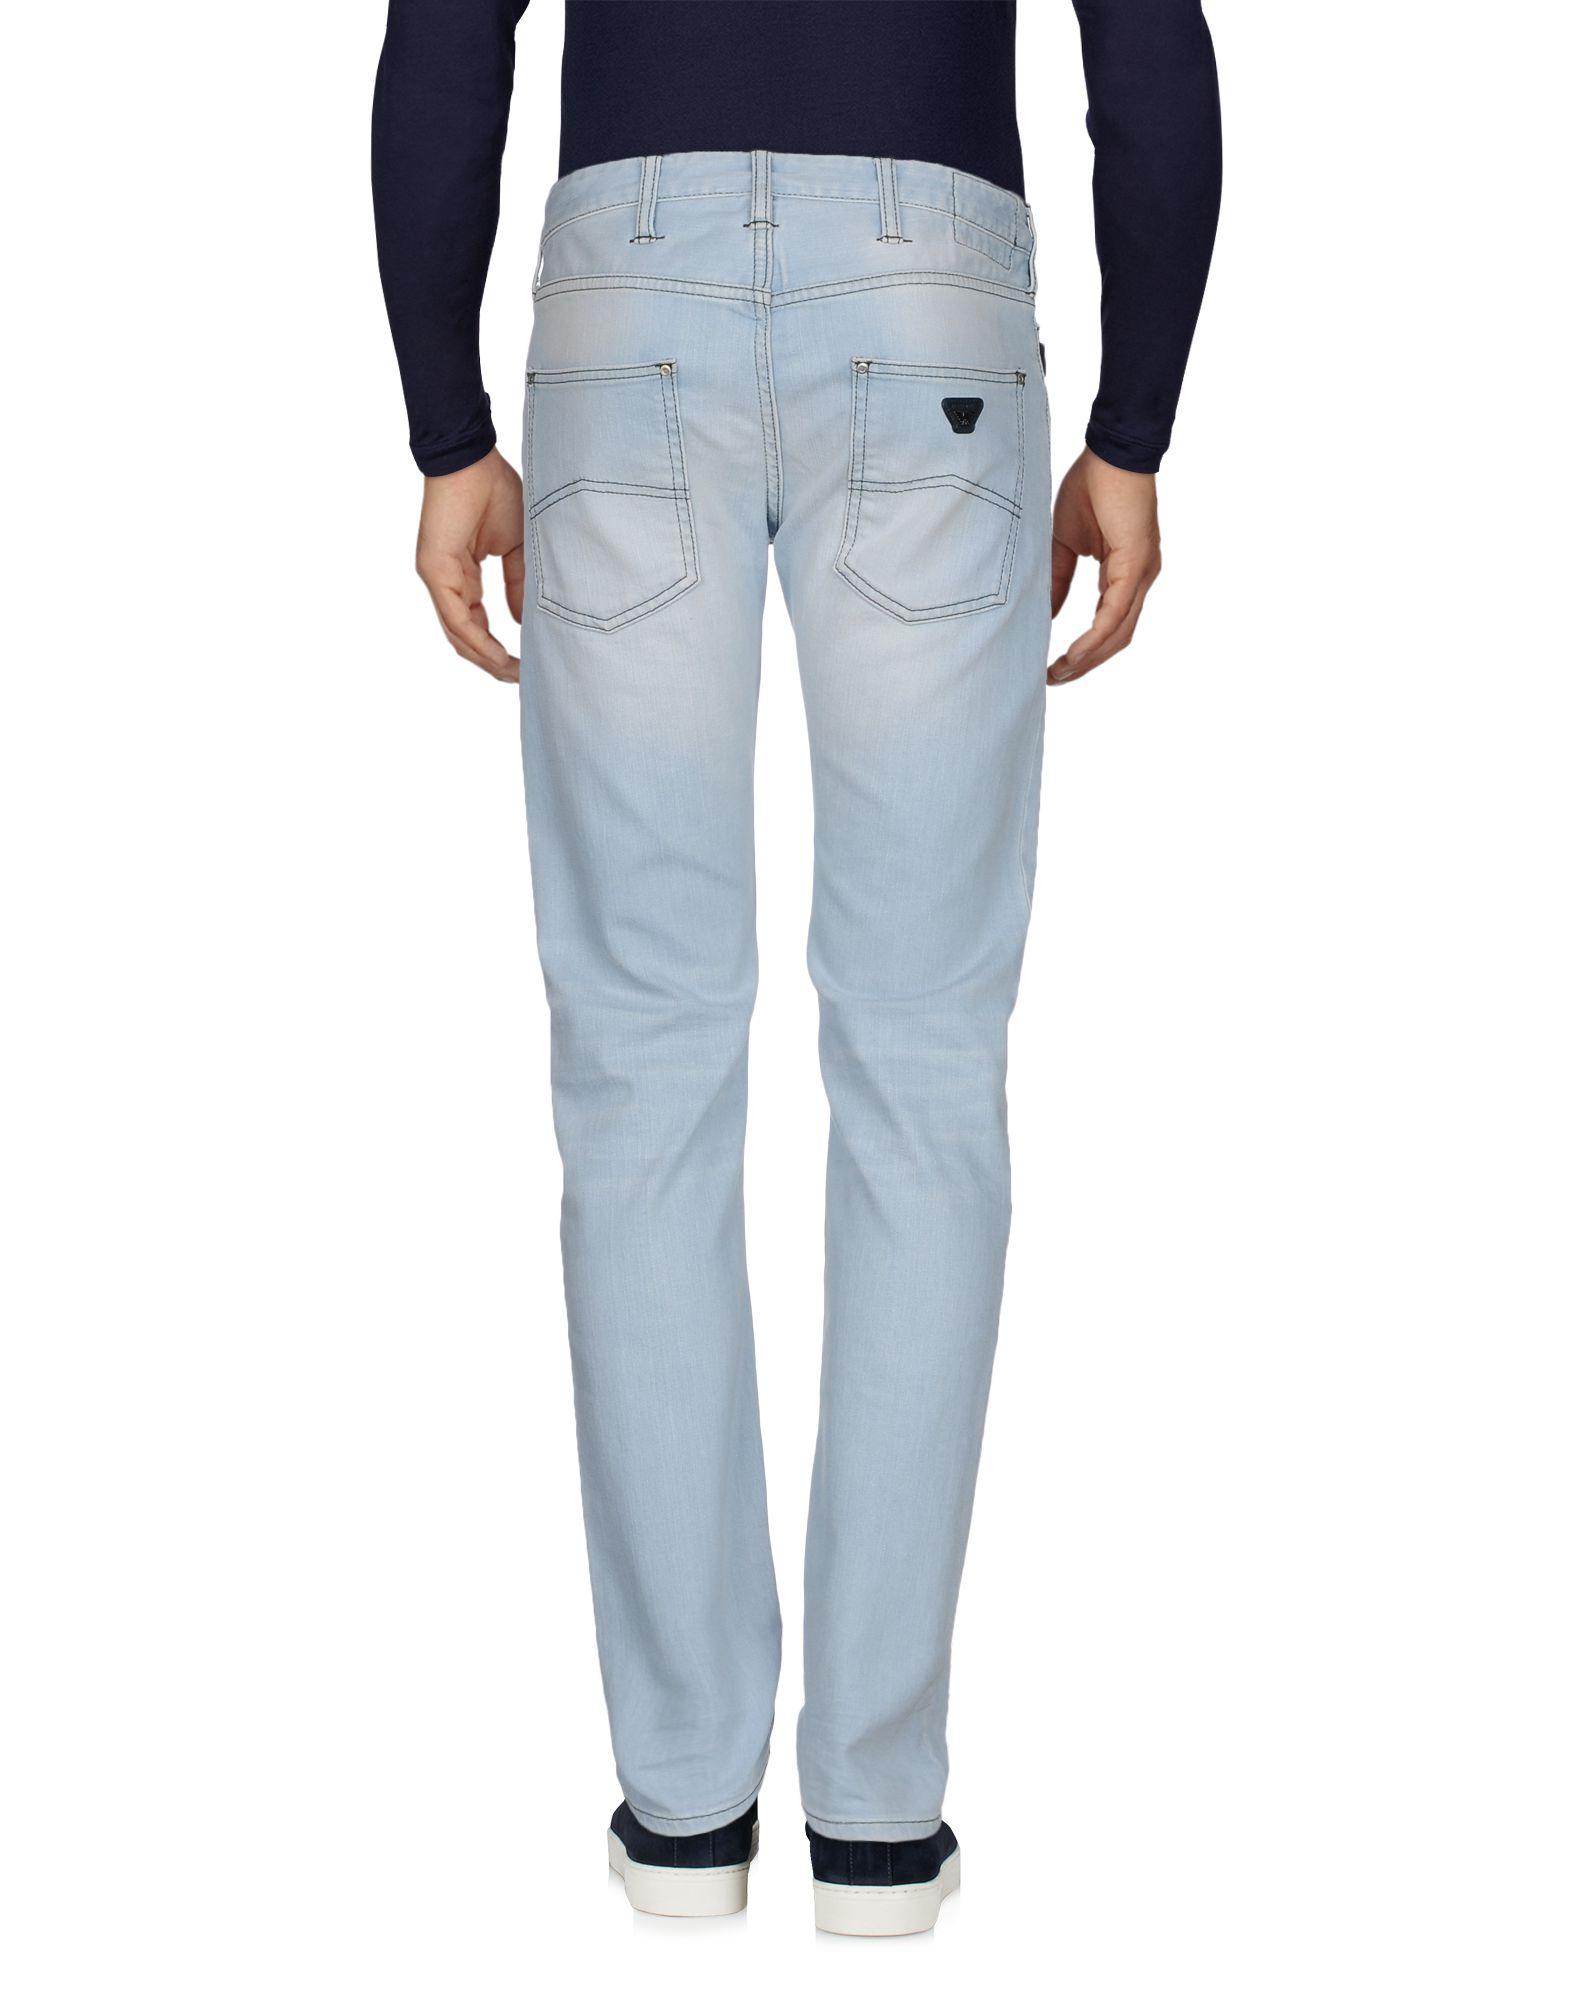 Pantaloni Jeans Armani Jeans Jeans Jeans Uomo - 42681464KF 72cc50